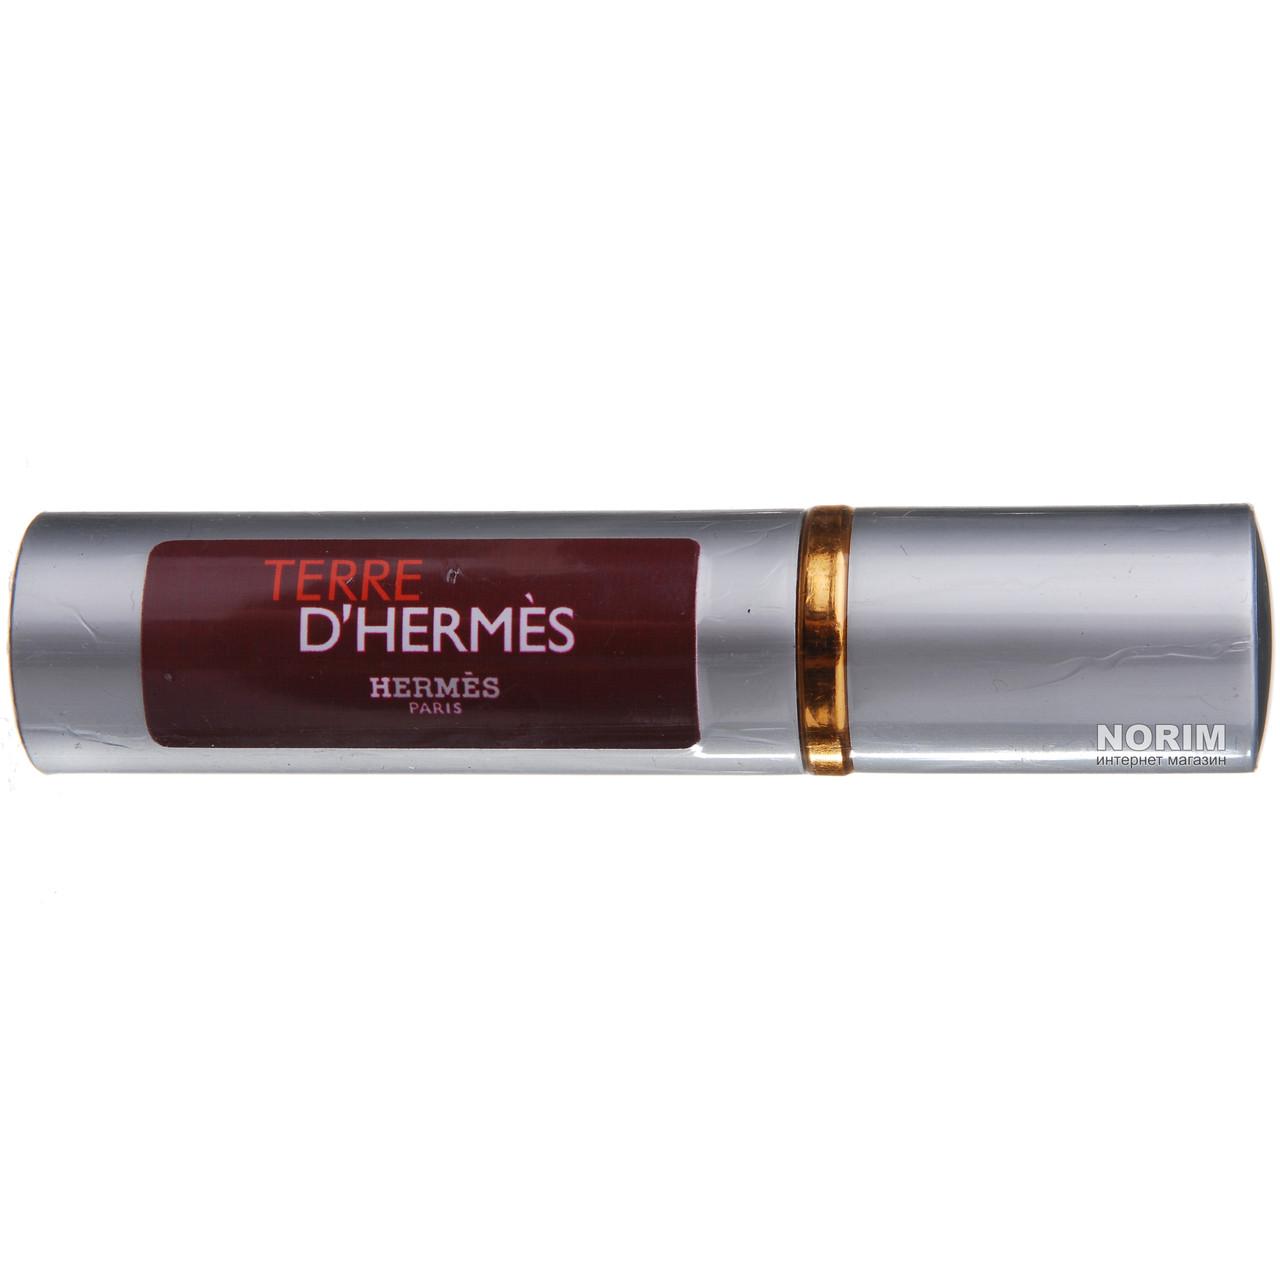 881617e78dfa Духи ручка мужские HERMES Terre d'hermes (реплика) интернет магазин ...